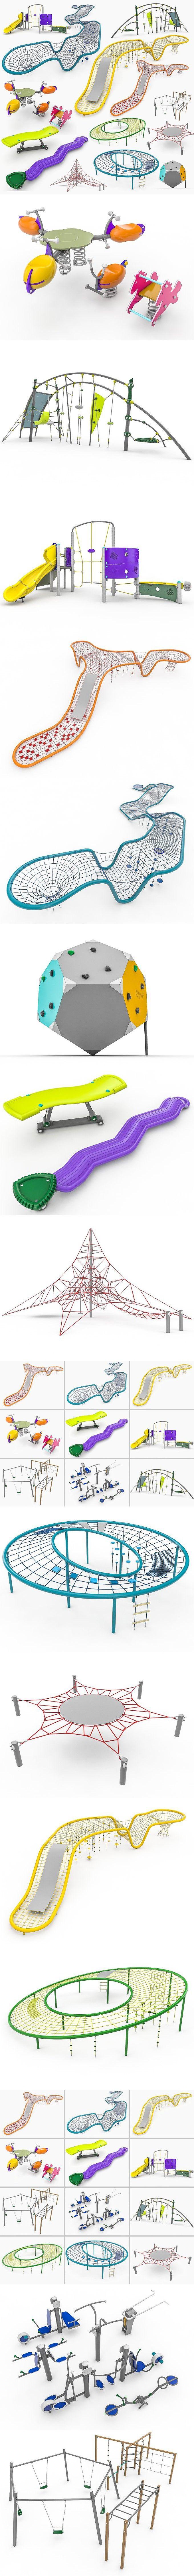 Kompan Playground Equipment Set. 3D Architecture